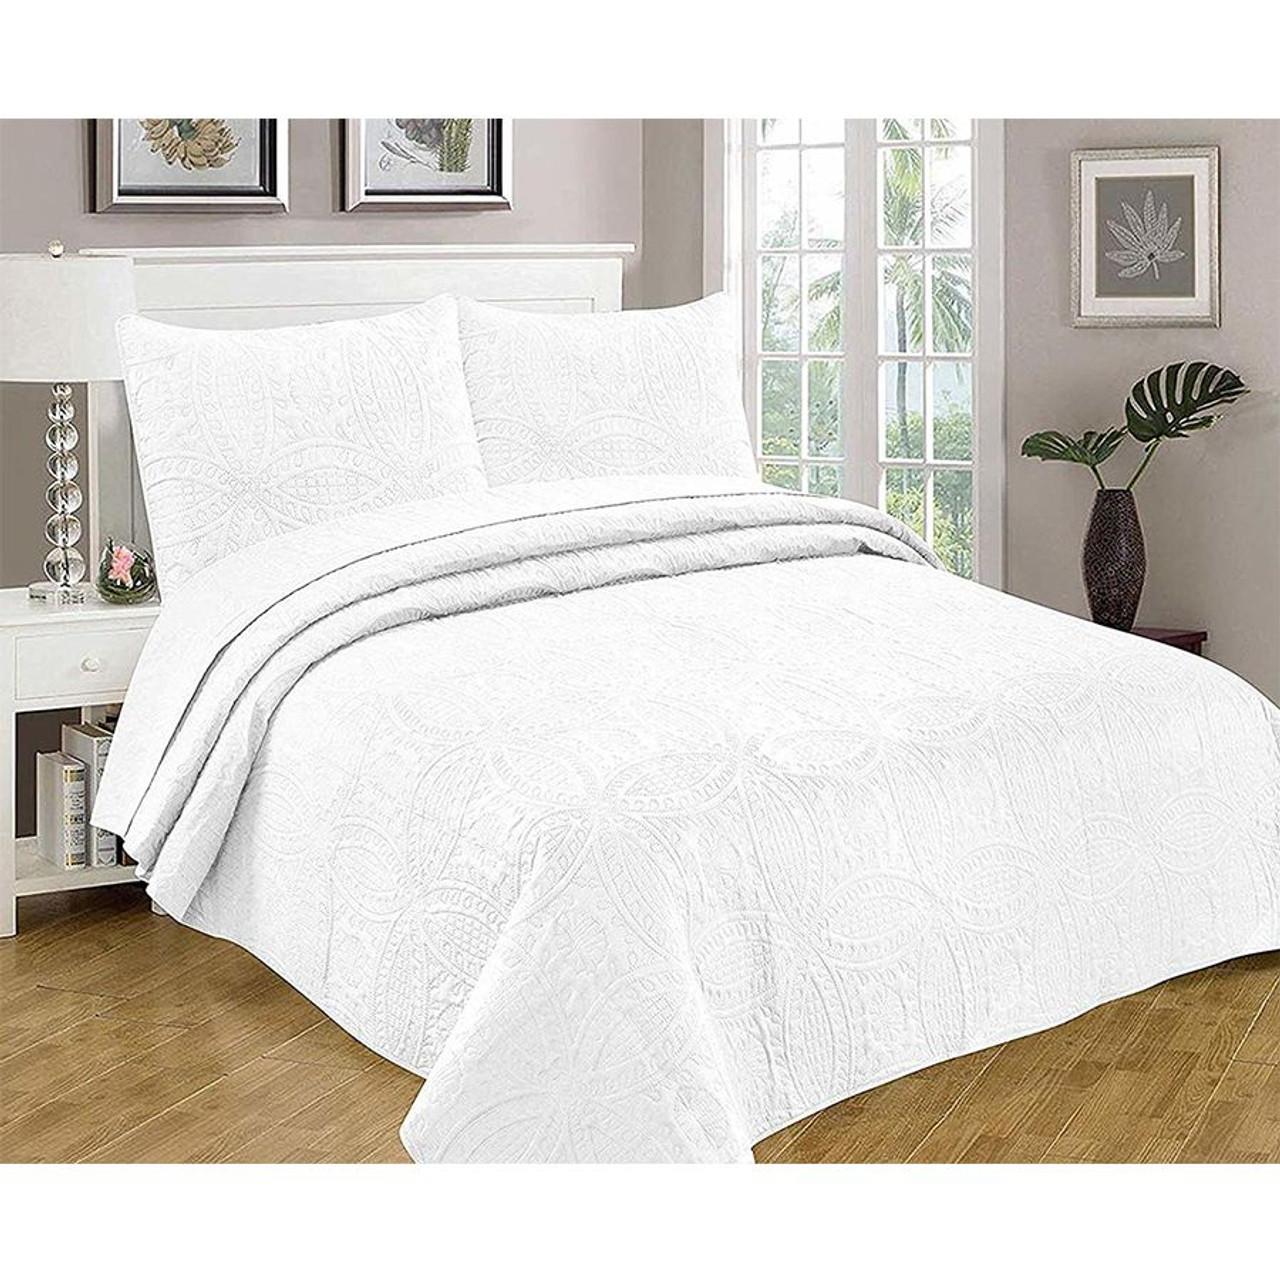 3 Pc Oversized Bedspread Coverlet Set White Color in USA, California, New York, New York City, Los Angeles, San Francisco, Pennsylvania, Washington DC, Virginia, Maryland